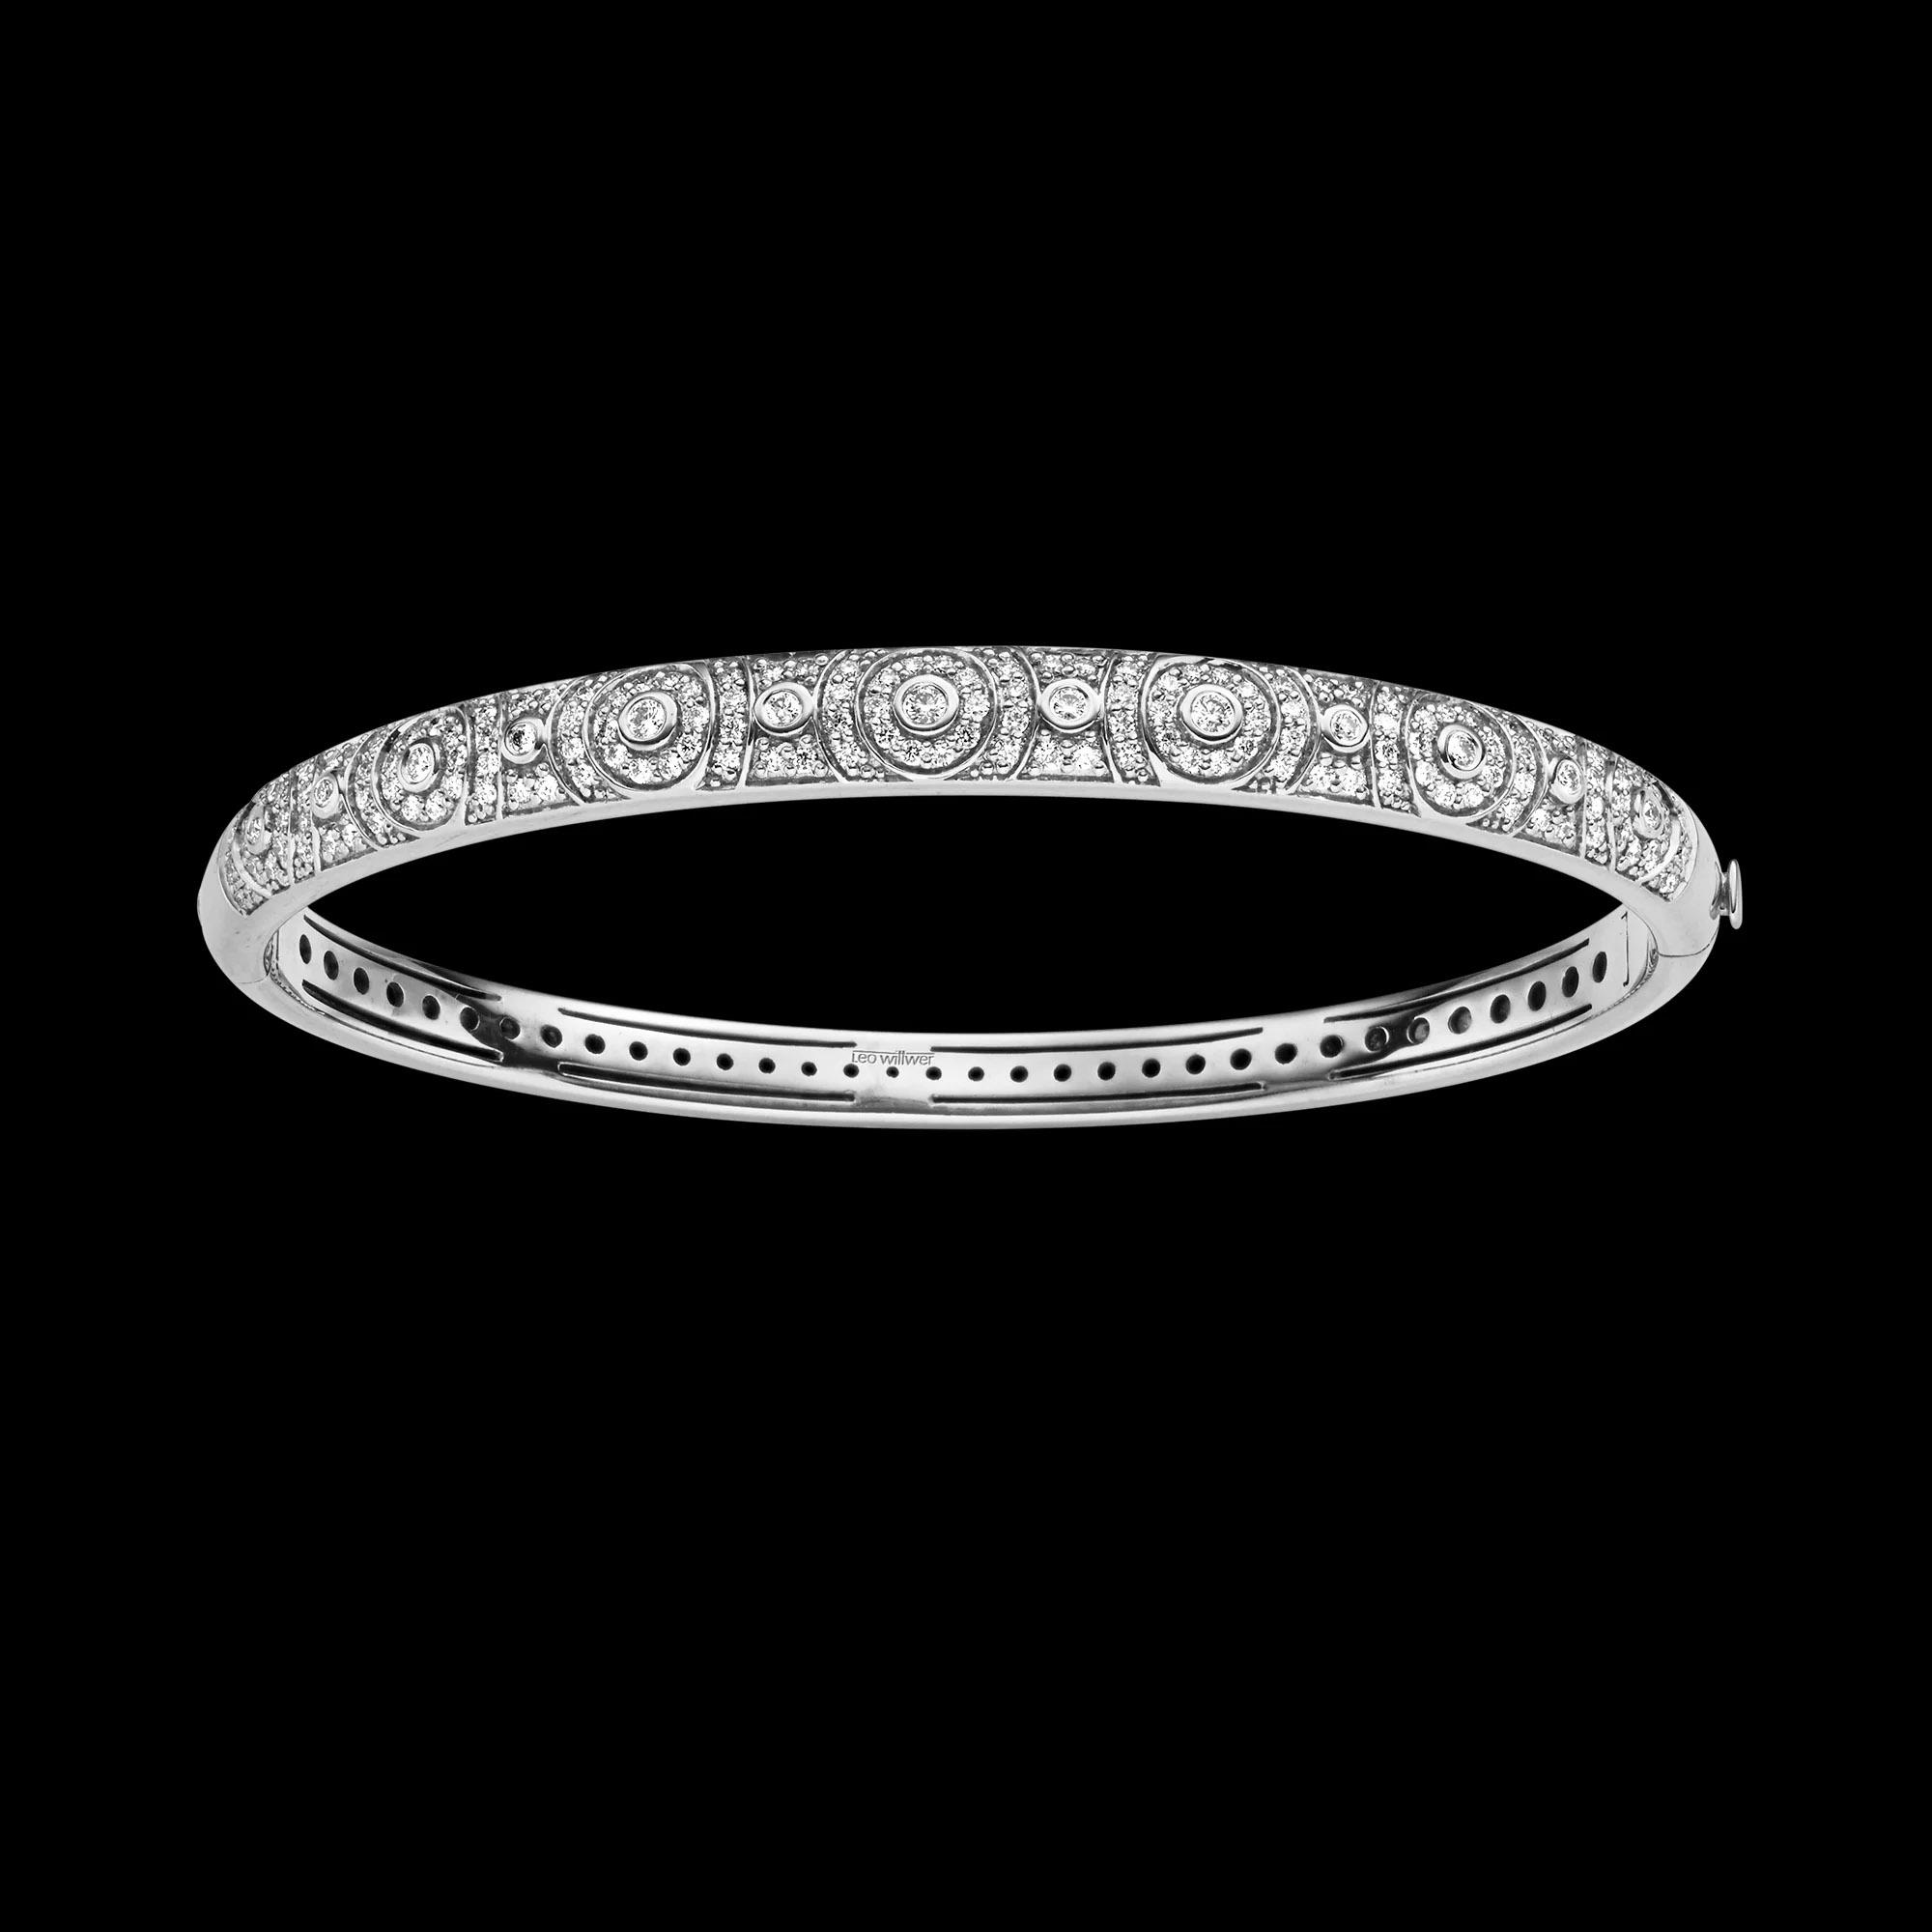 Wholesale customized rhodium plated bracelet silver jewelry manufacturer OEM/ODM Jewelry